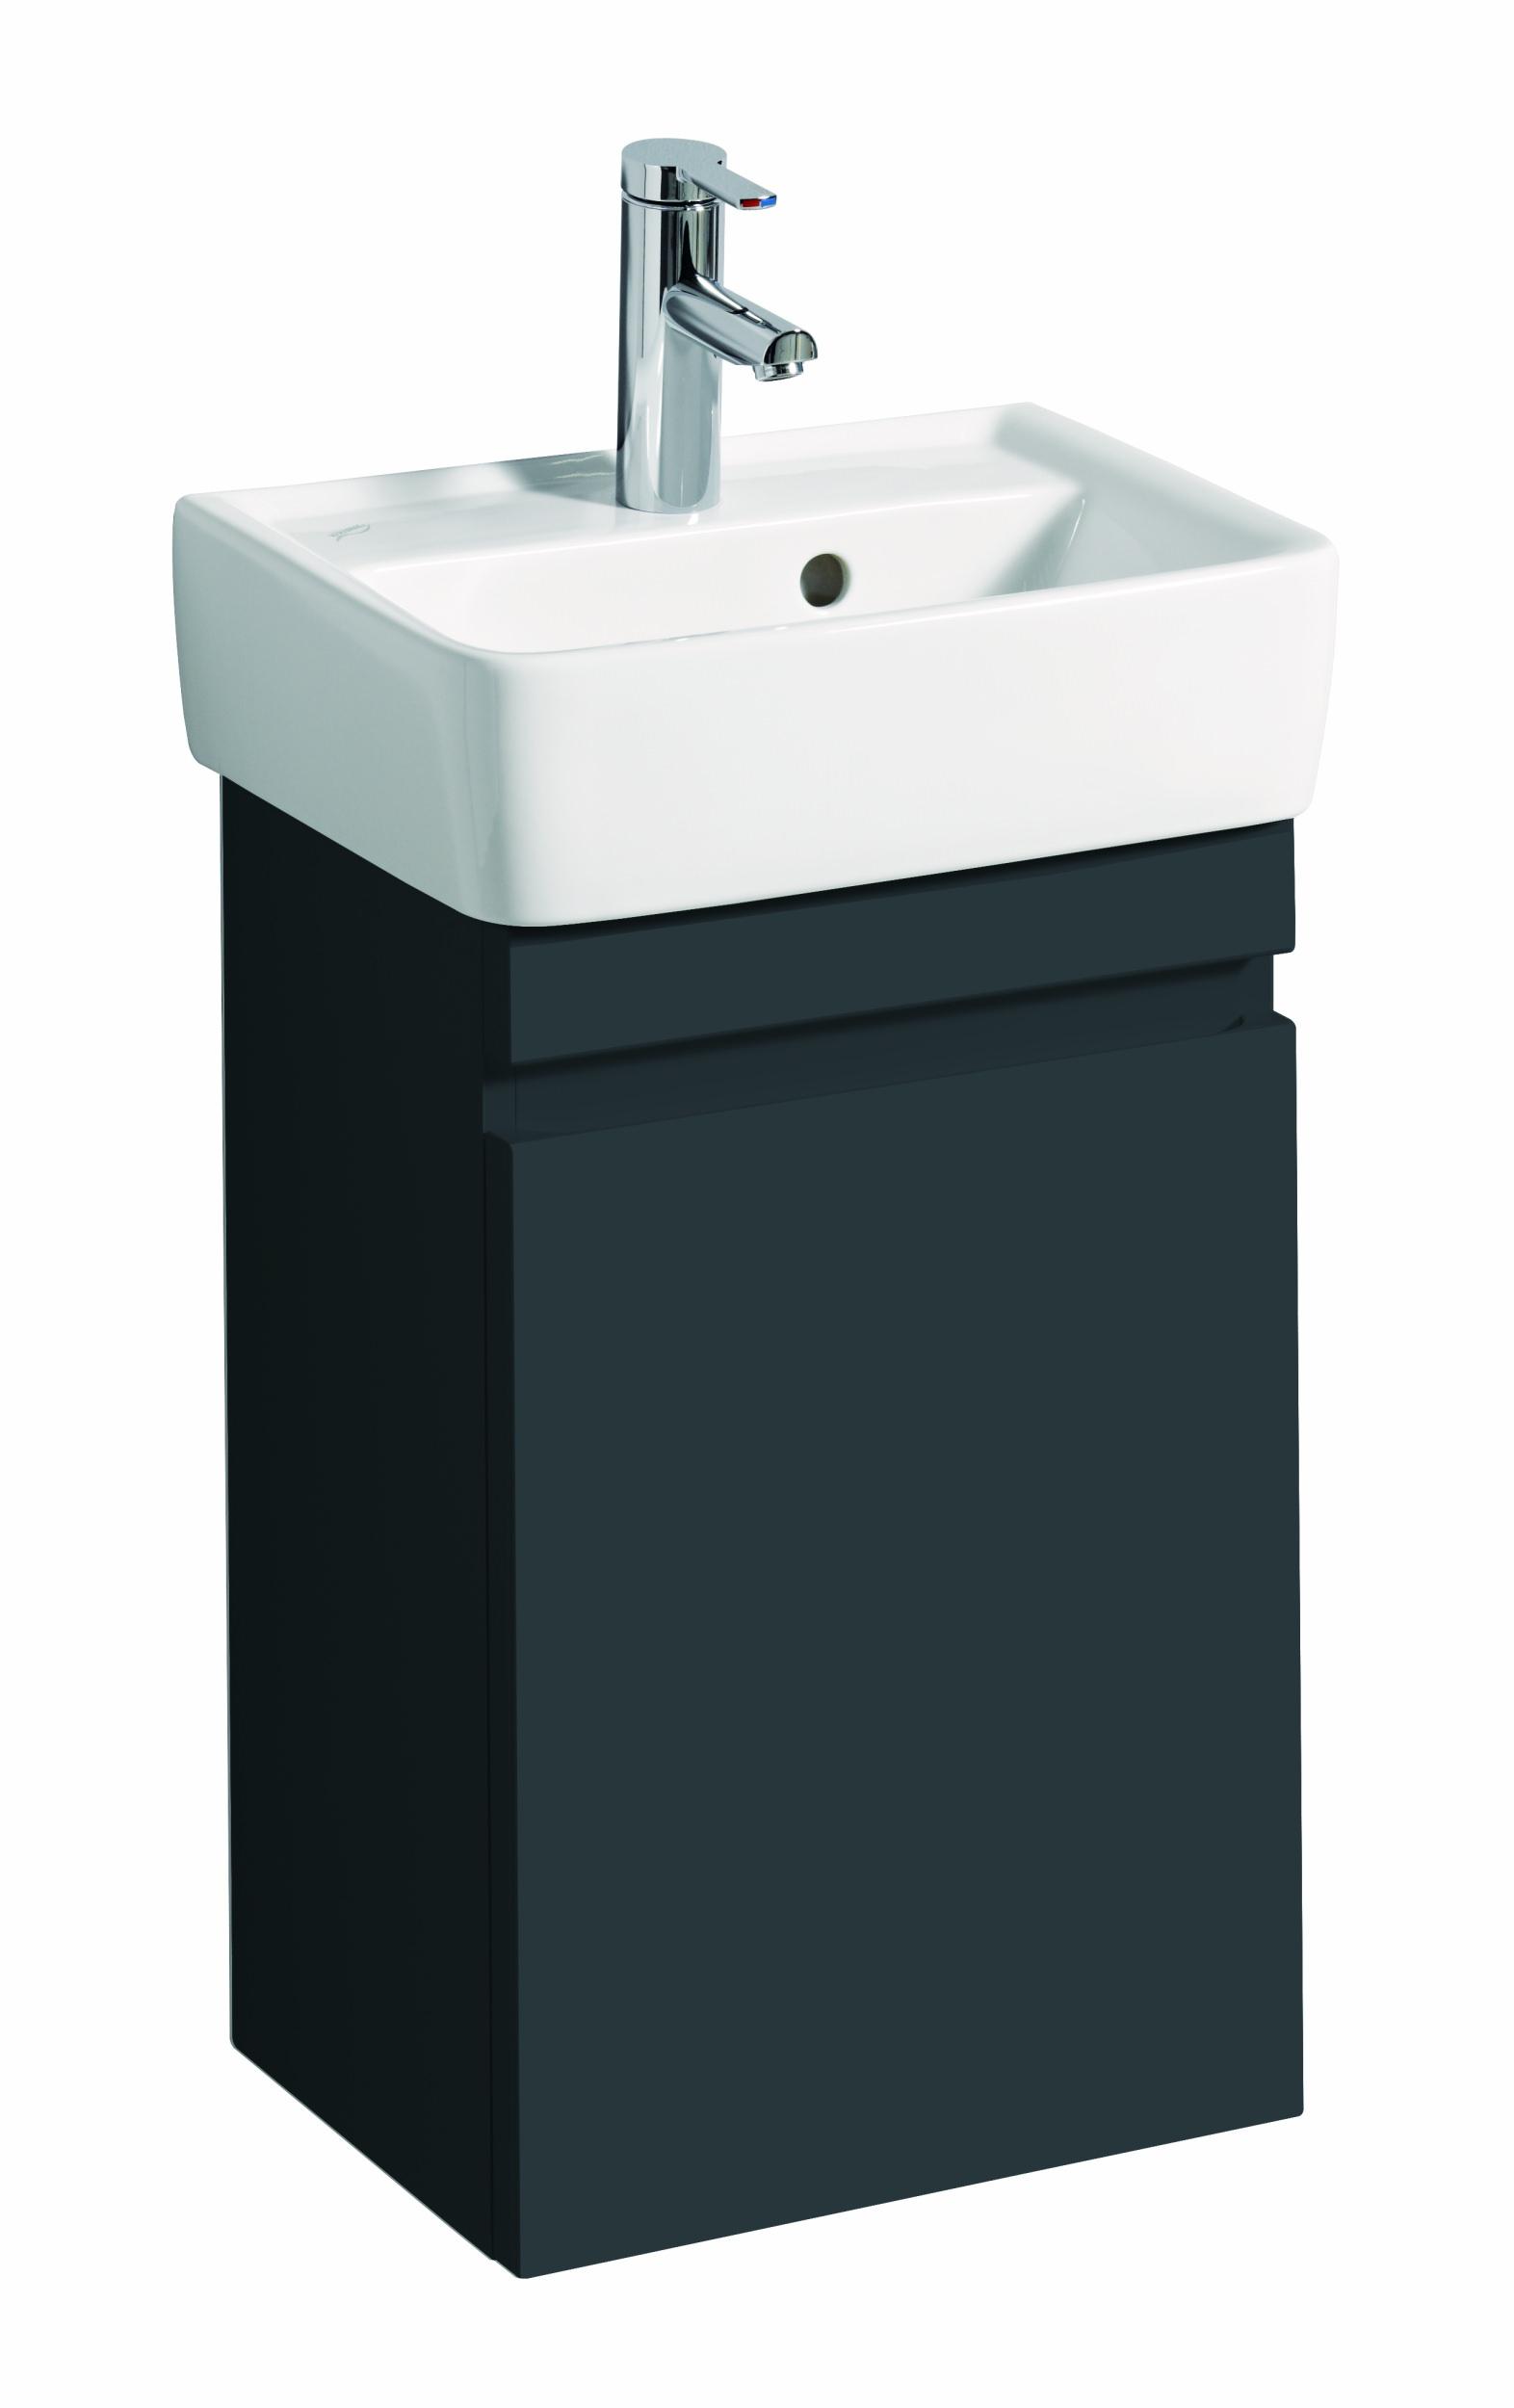 keramag renova nr 1 plan handwaschbecken unterchrank 394x586x295mm t ranschlag rechts links. Black Bedroom Furniture Sets. Home Design Ideas